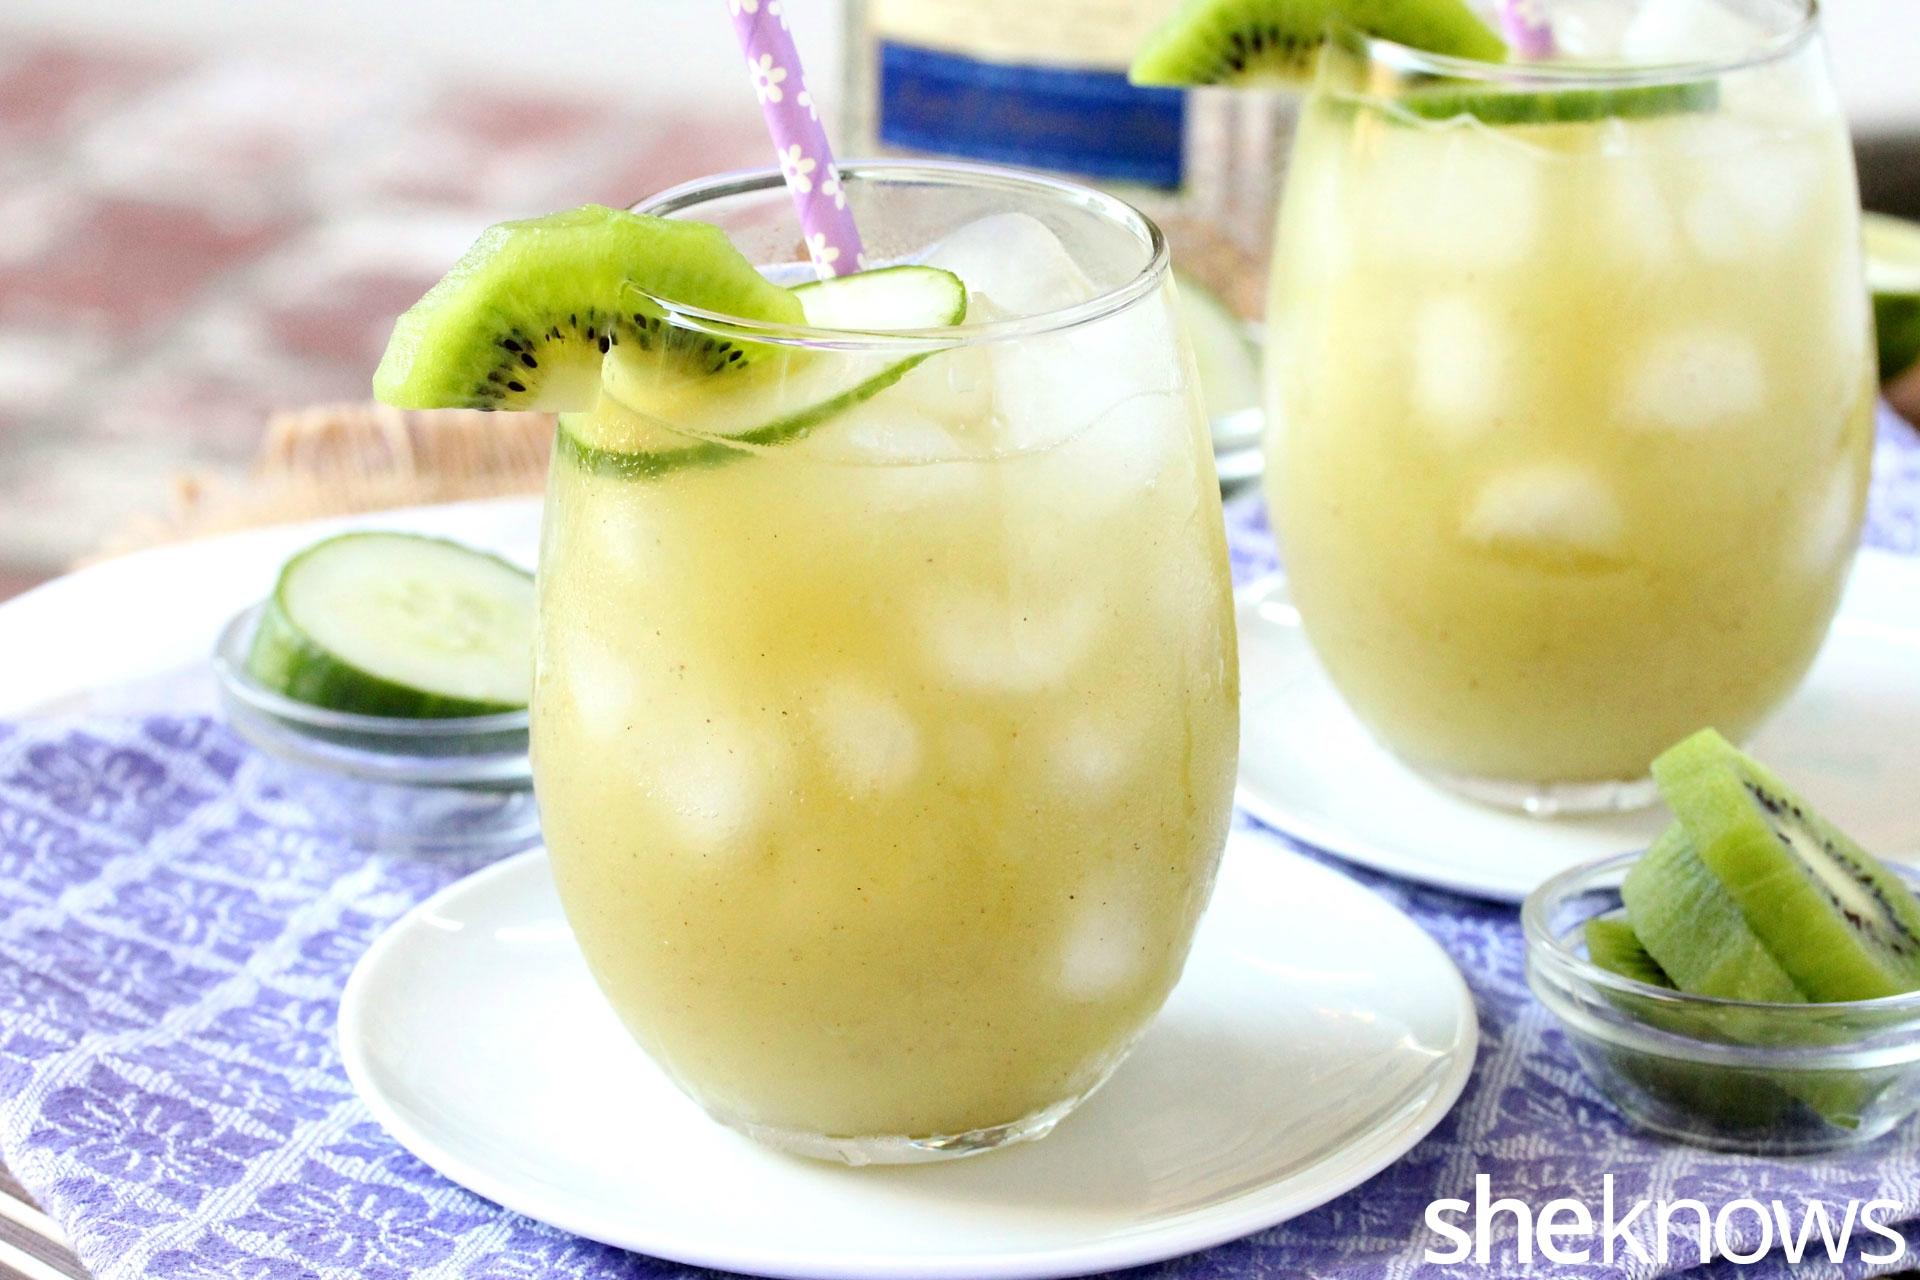 kiwi-cucumber-aqua-fresca-in-glass